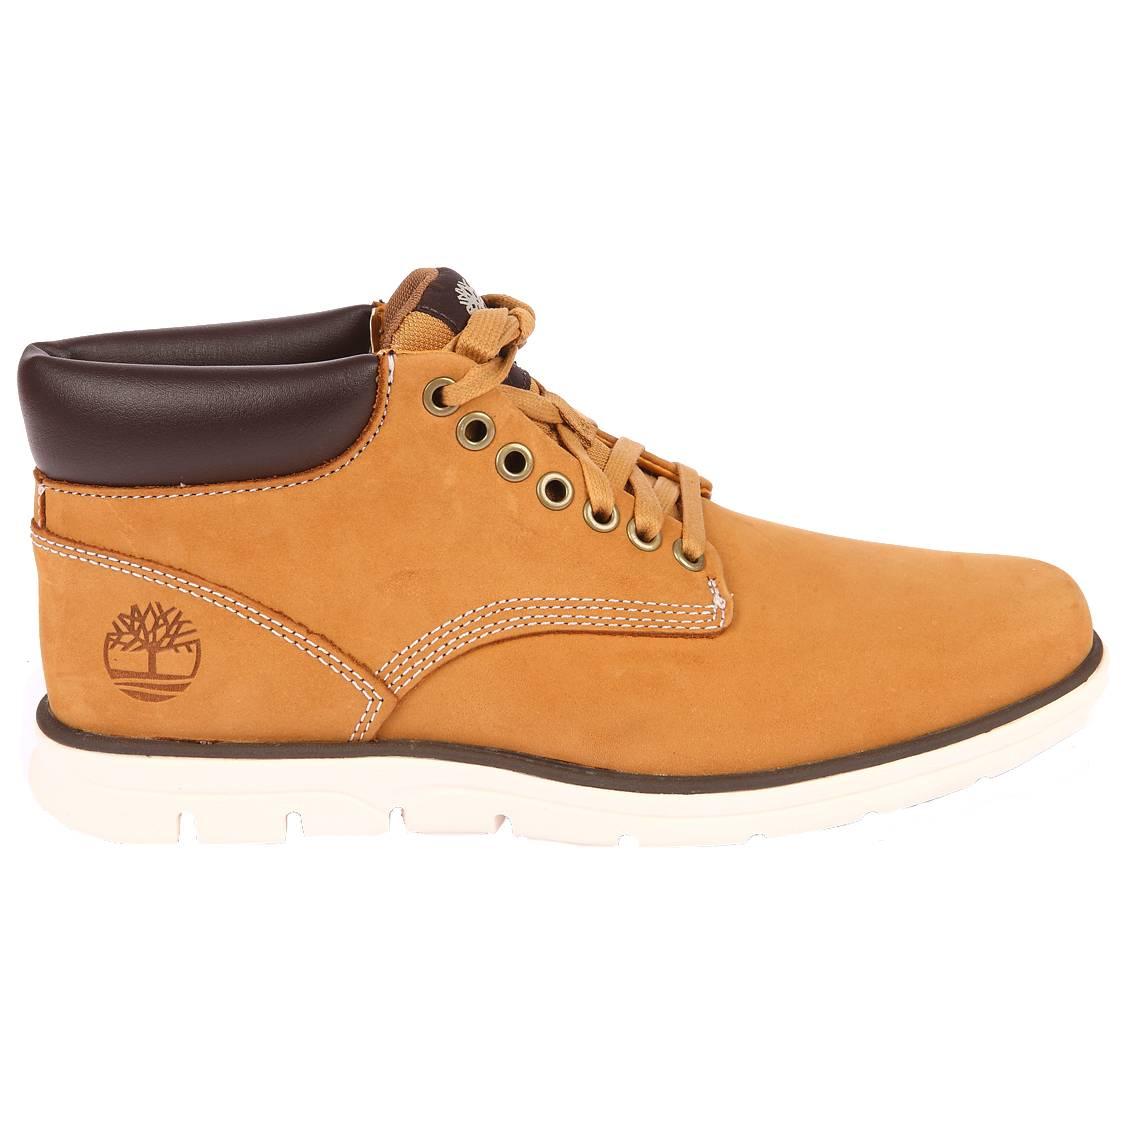 Boots fines  bradstreet en cuir véritable camel